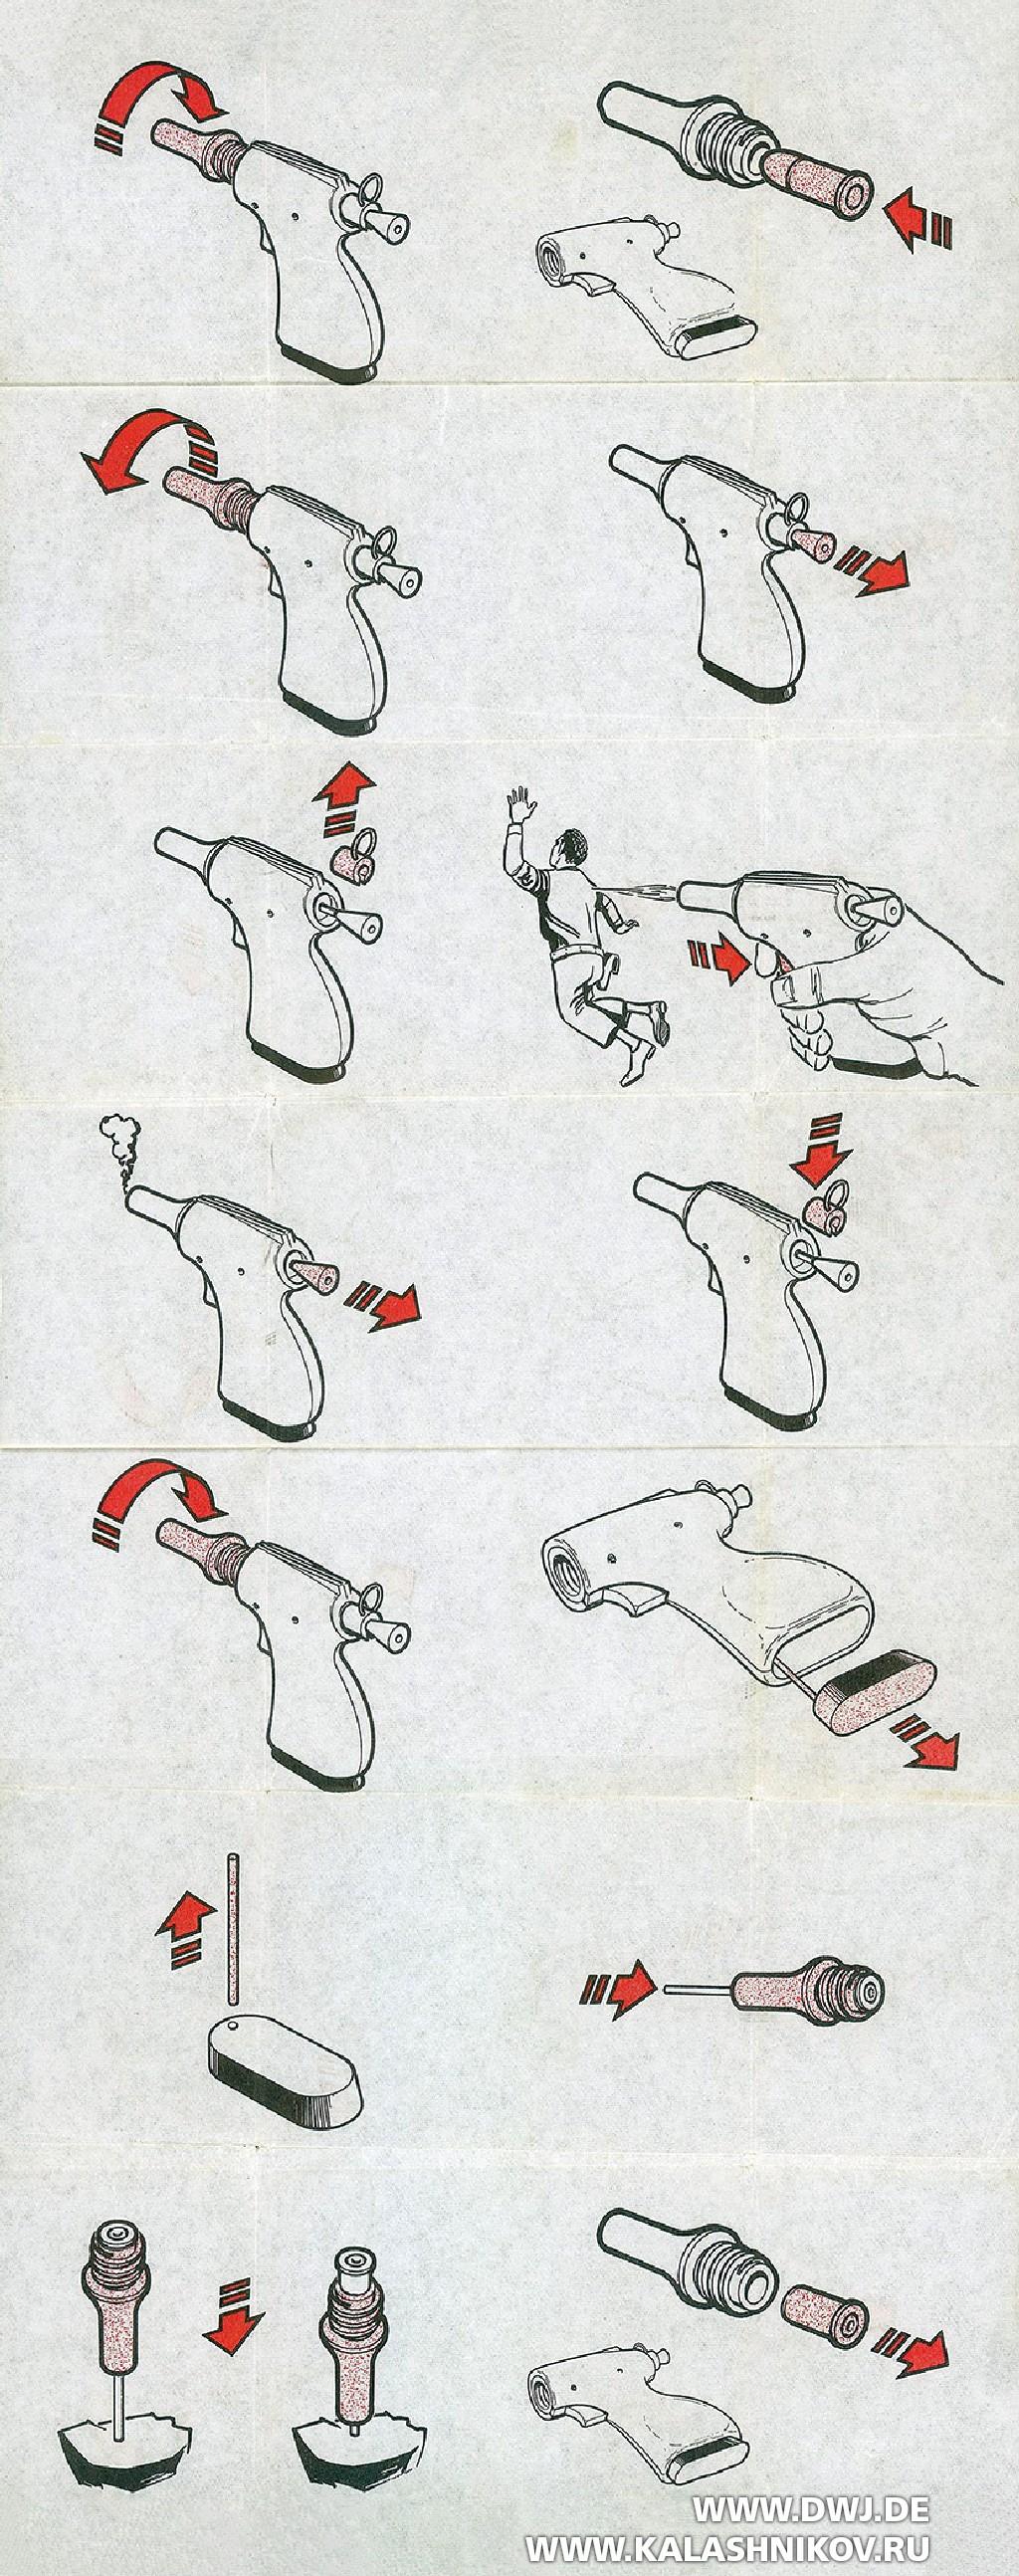 Пистолет DEAR Pistol. Фото 9